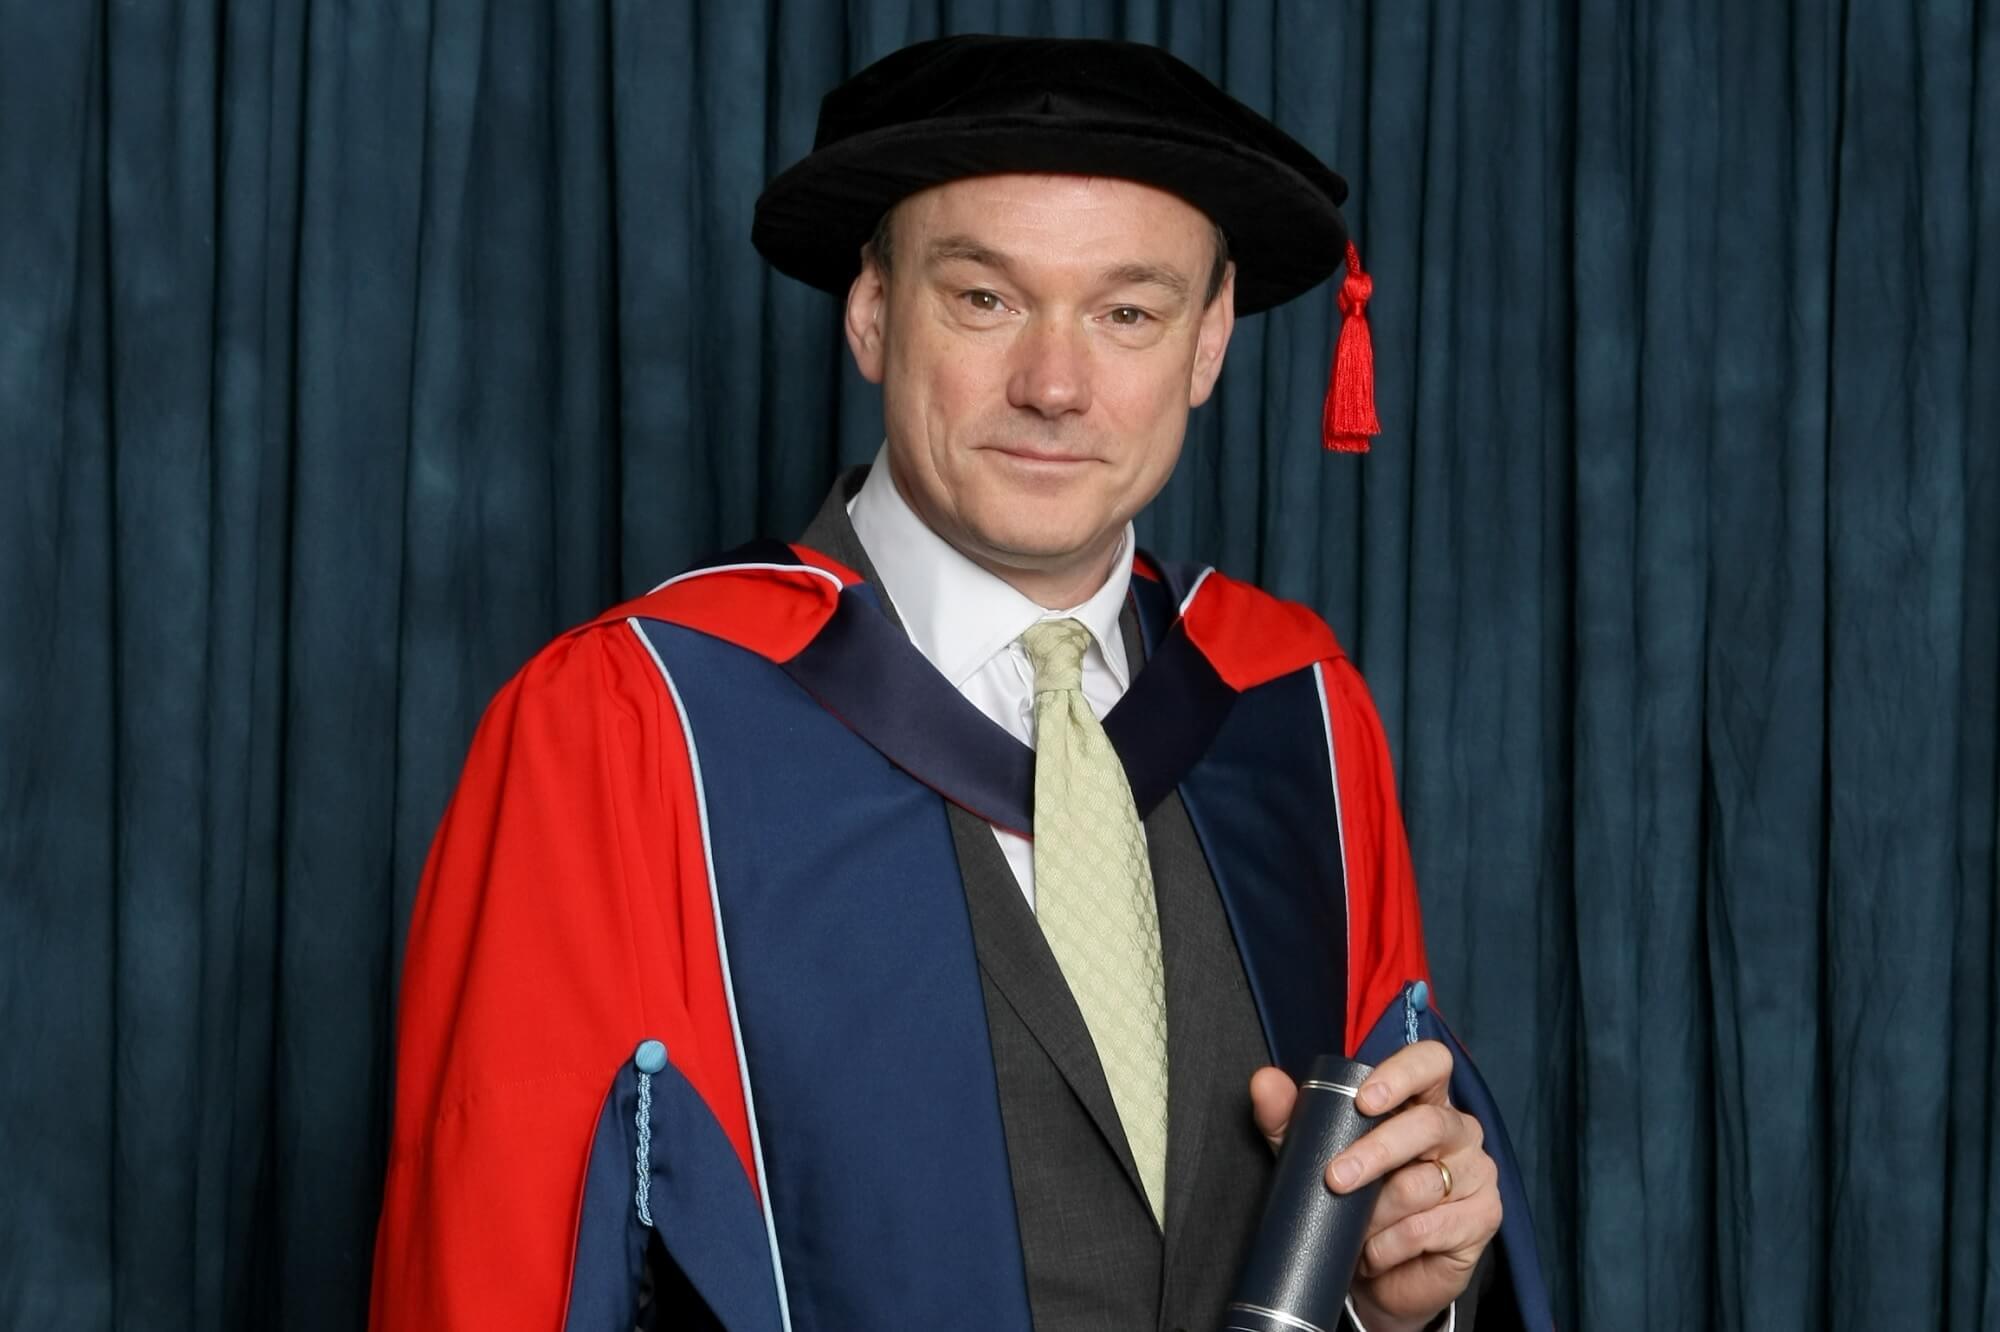 Stephen Page receiving his honorary degree (HonDUniv)